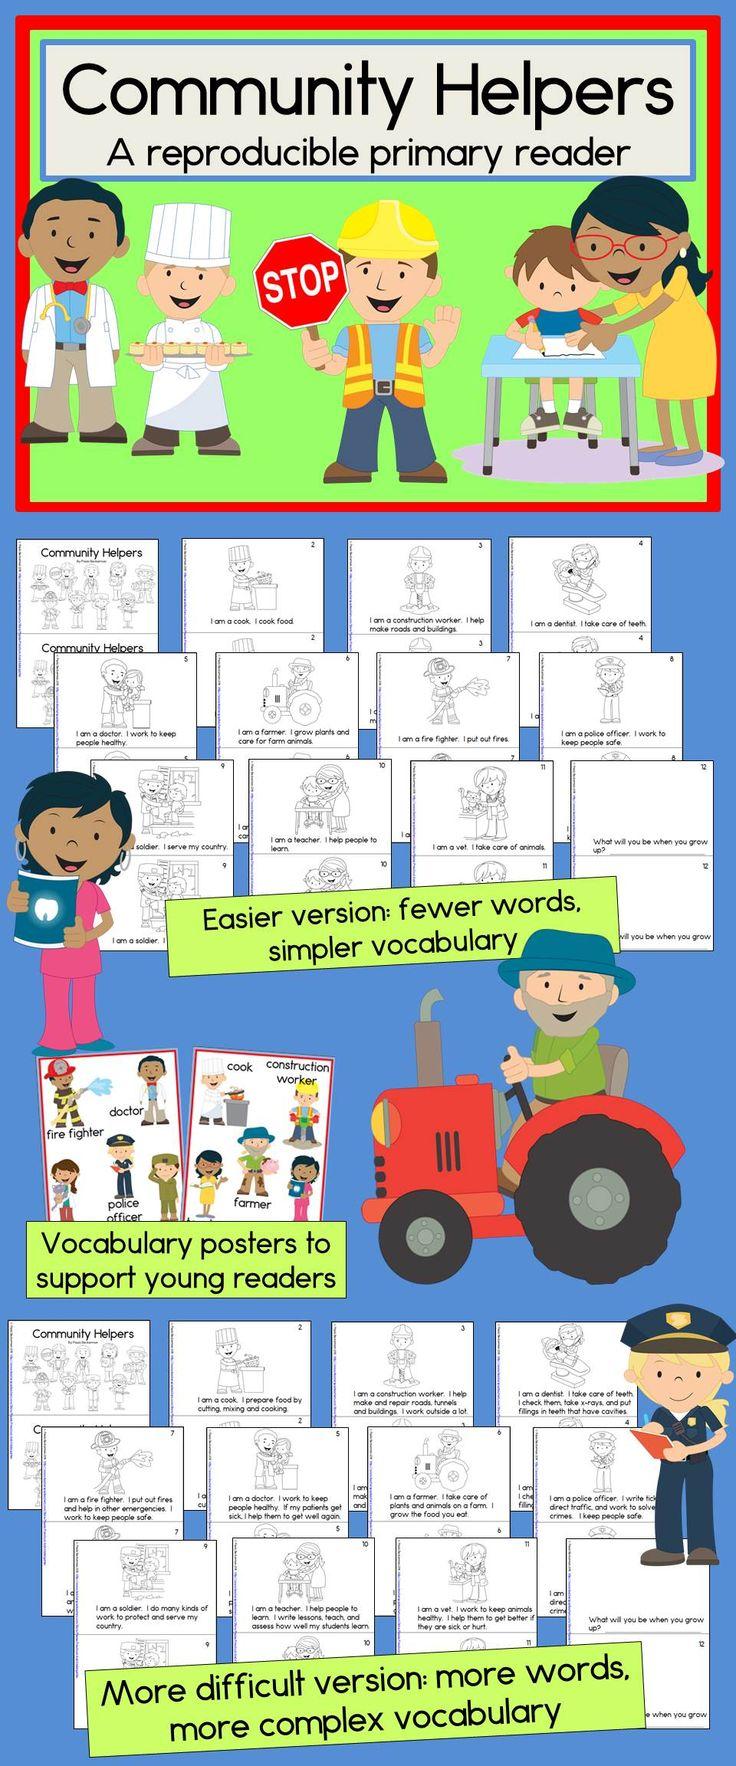 worksheet Reproducible Student Worksheet Luizah Worksheet And – Reproducible Student Worksheet